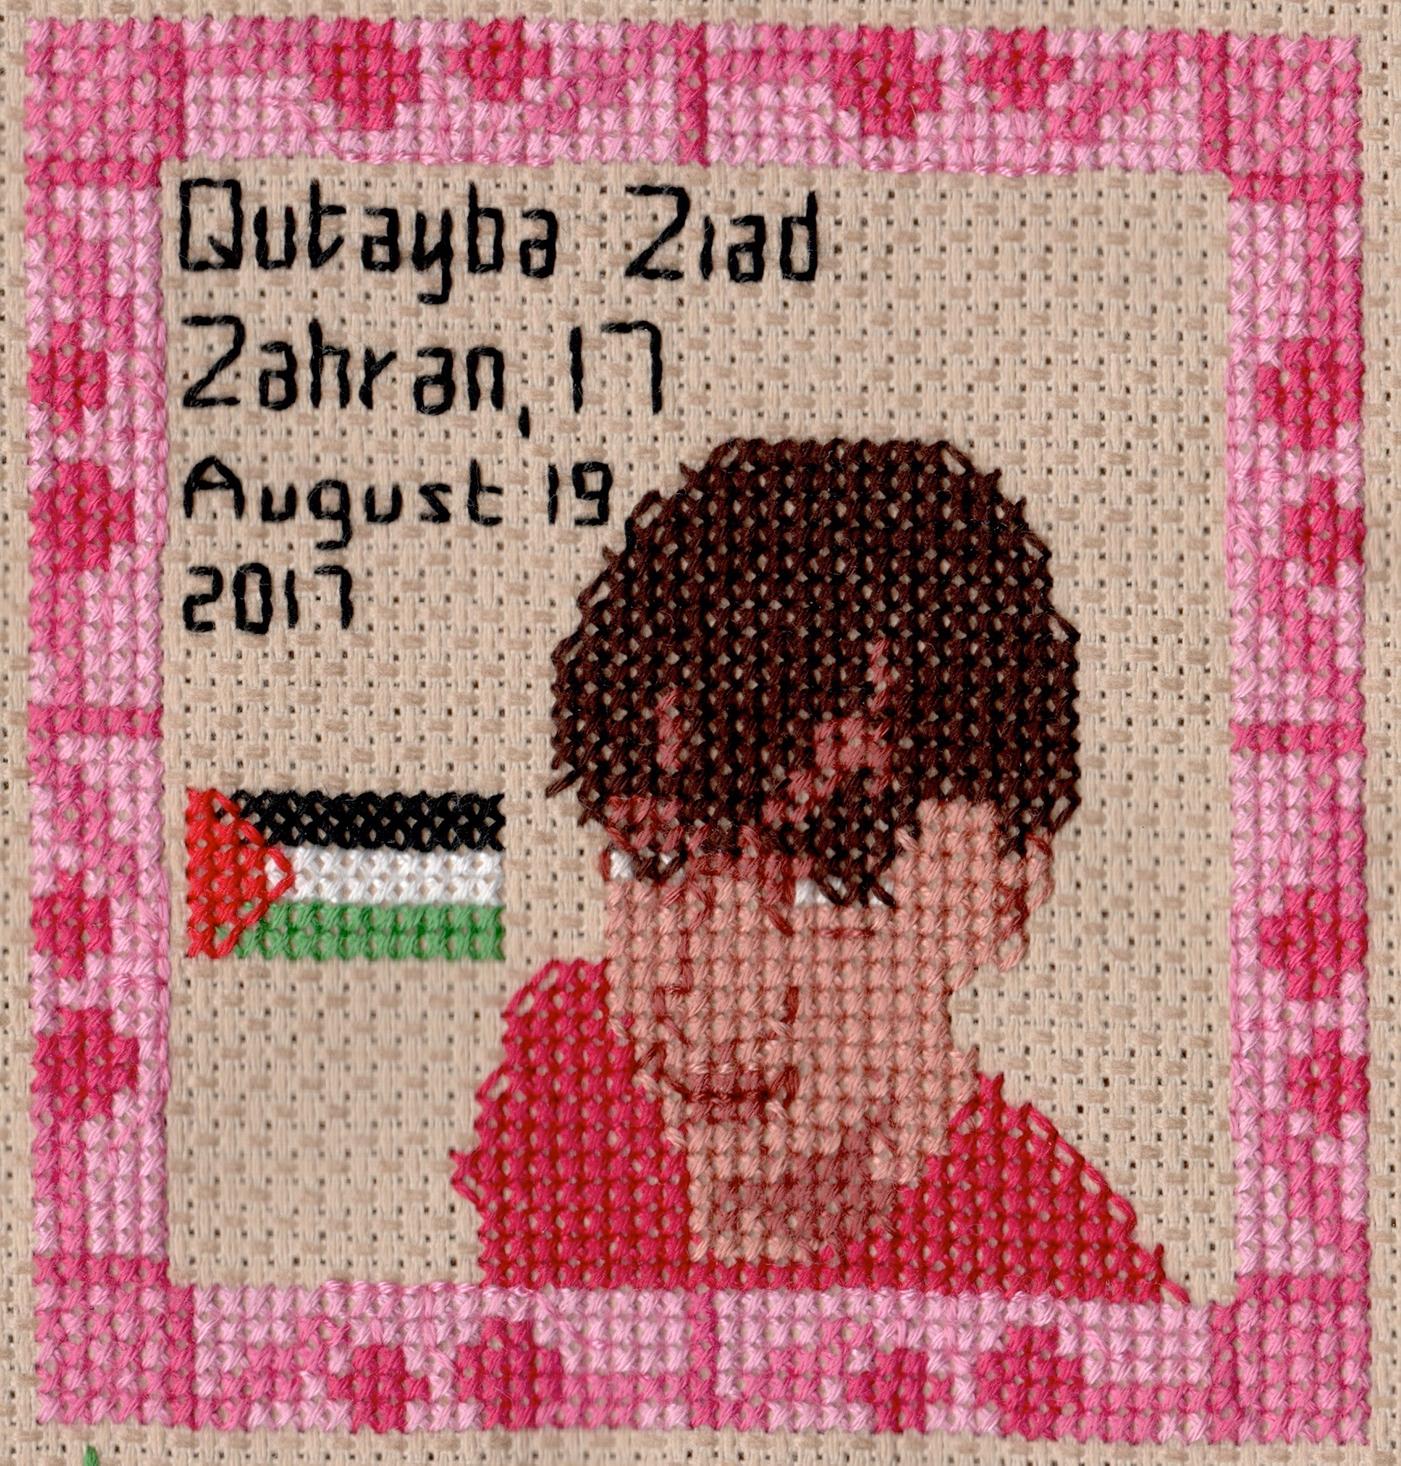 Priti_8-QutaybaZahran.jpg